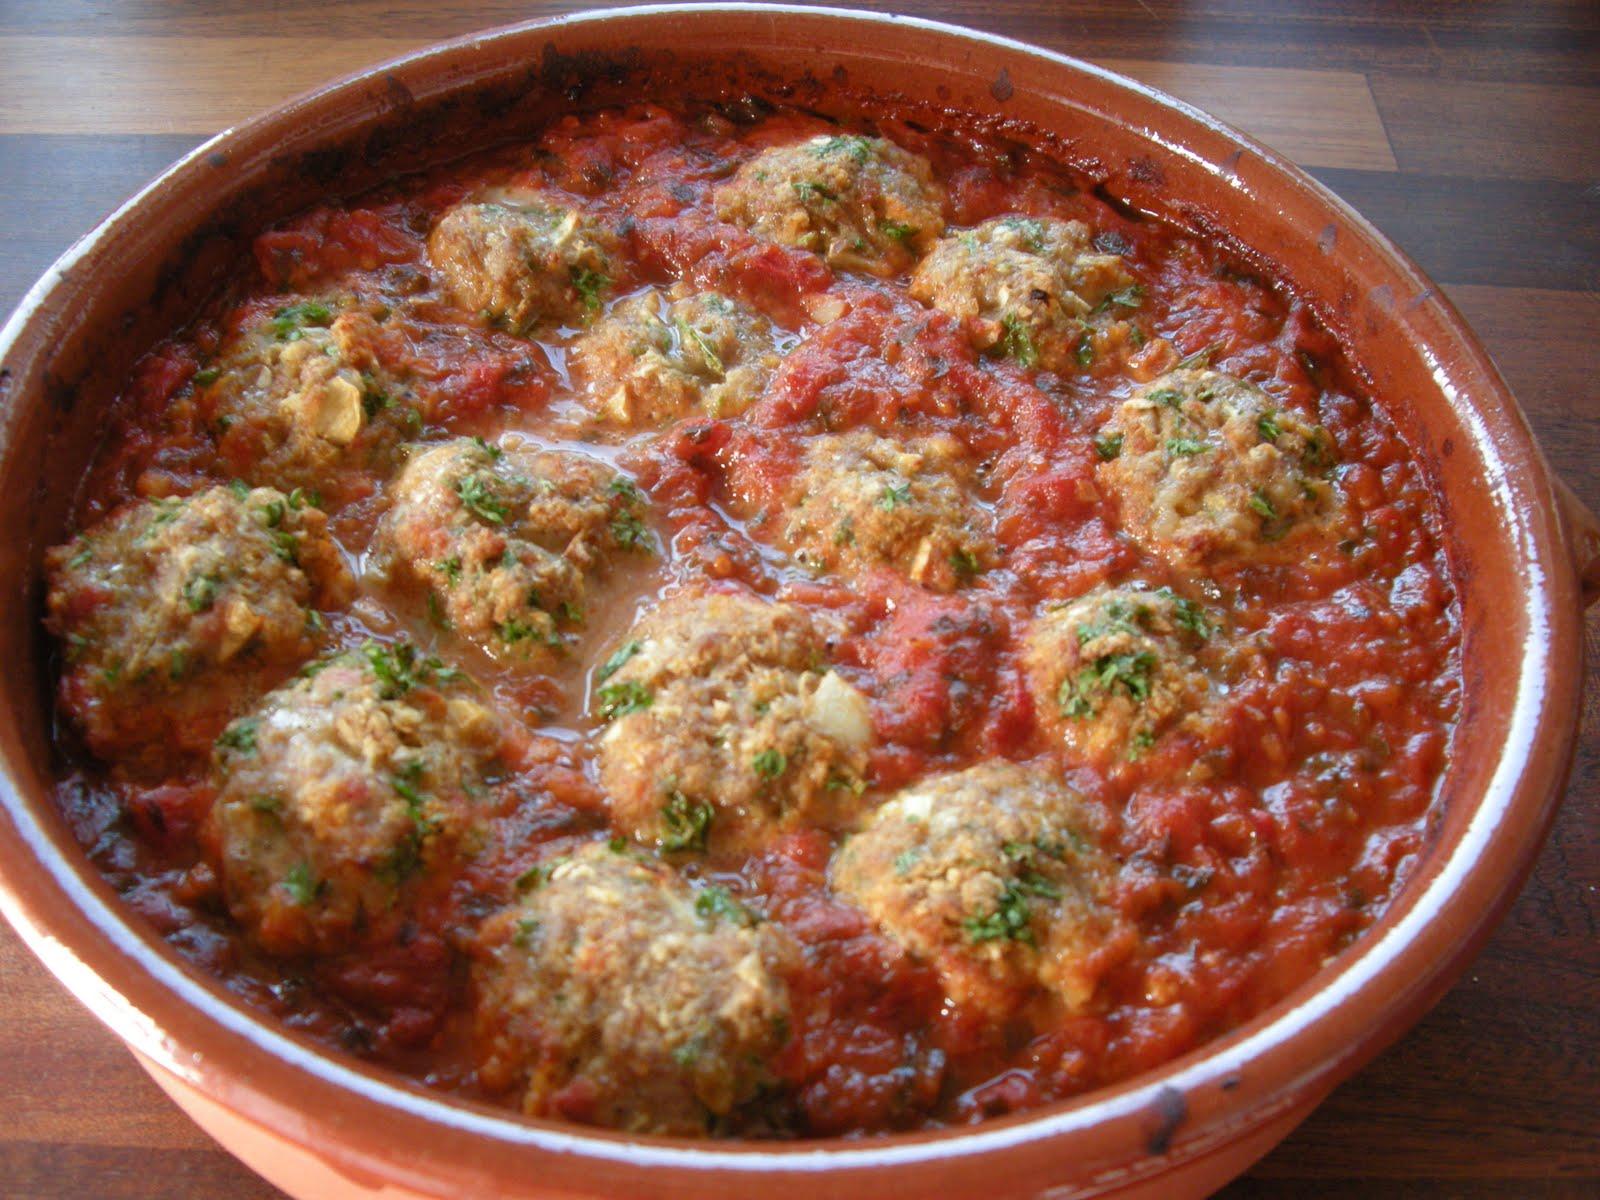 Albondigas Opskrift ullas køkken: albondigas